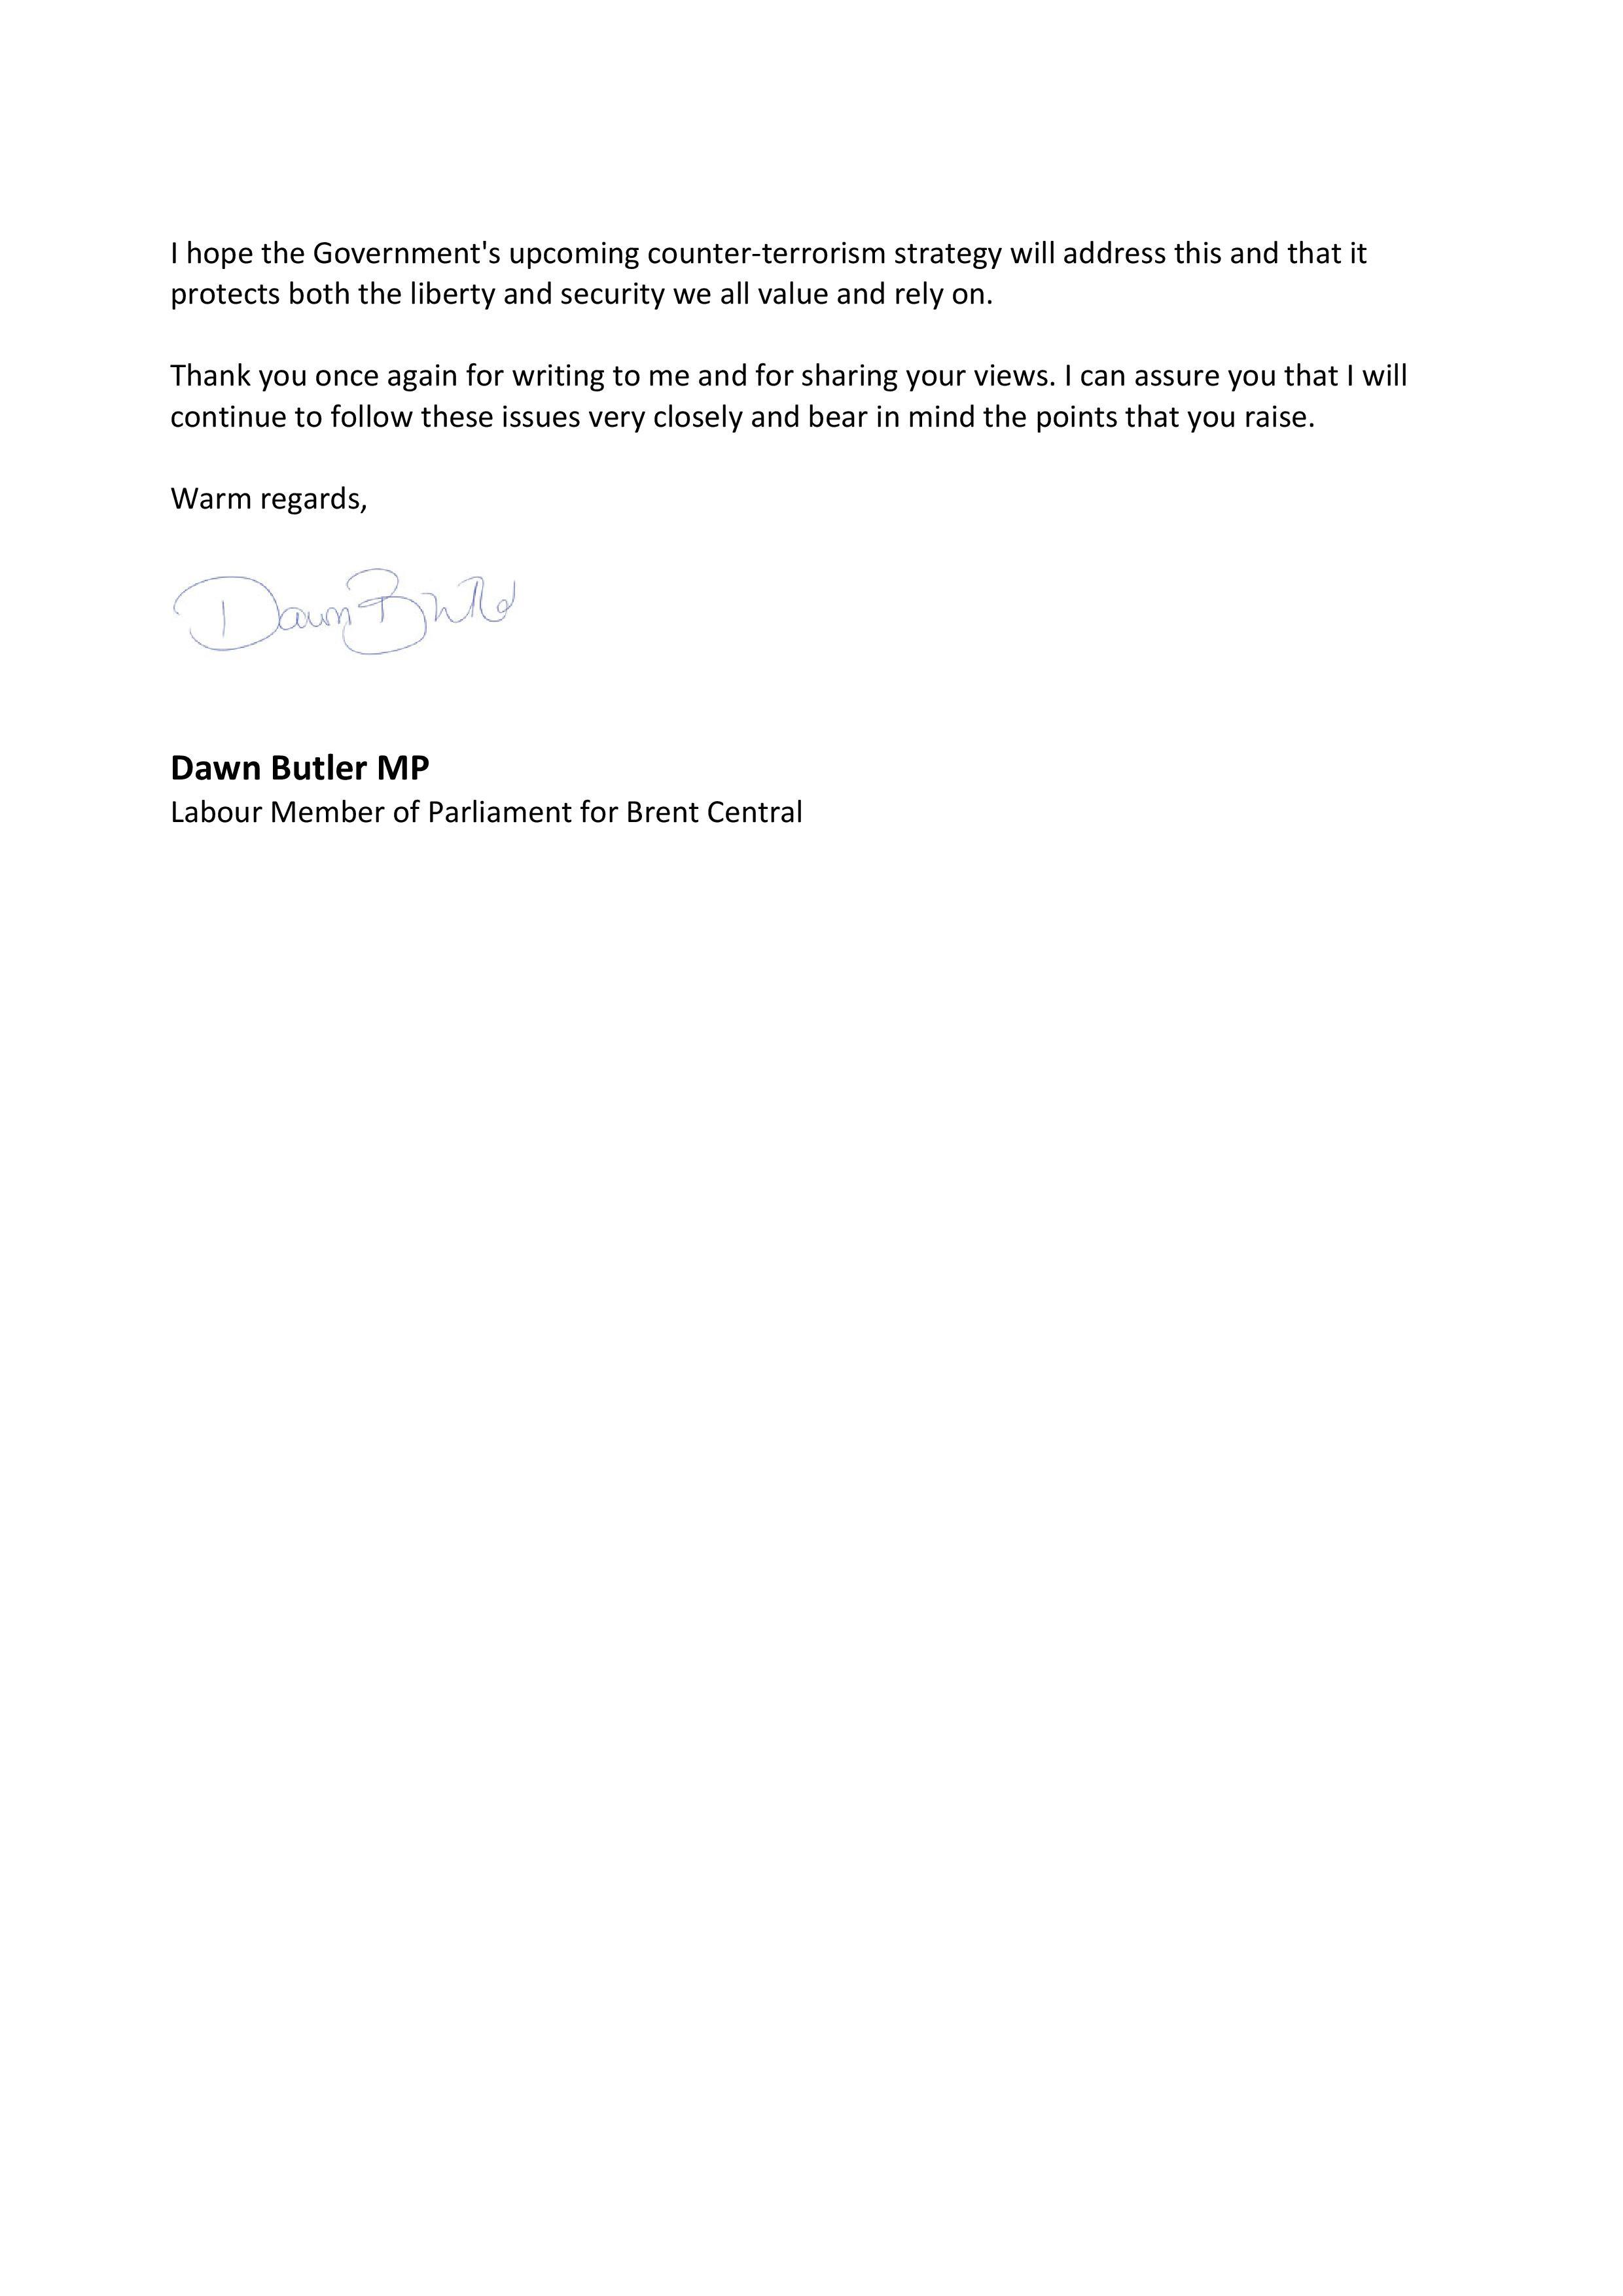 Extremism_Disruption_Order-page-002.jpg